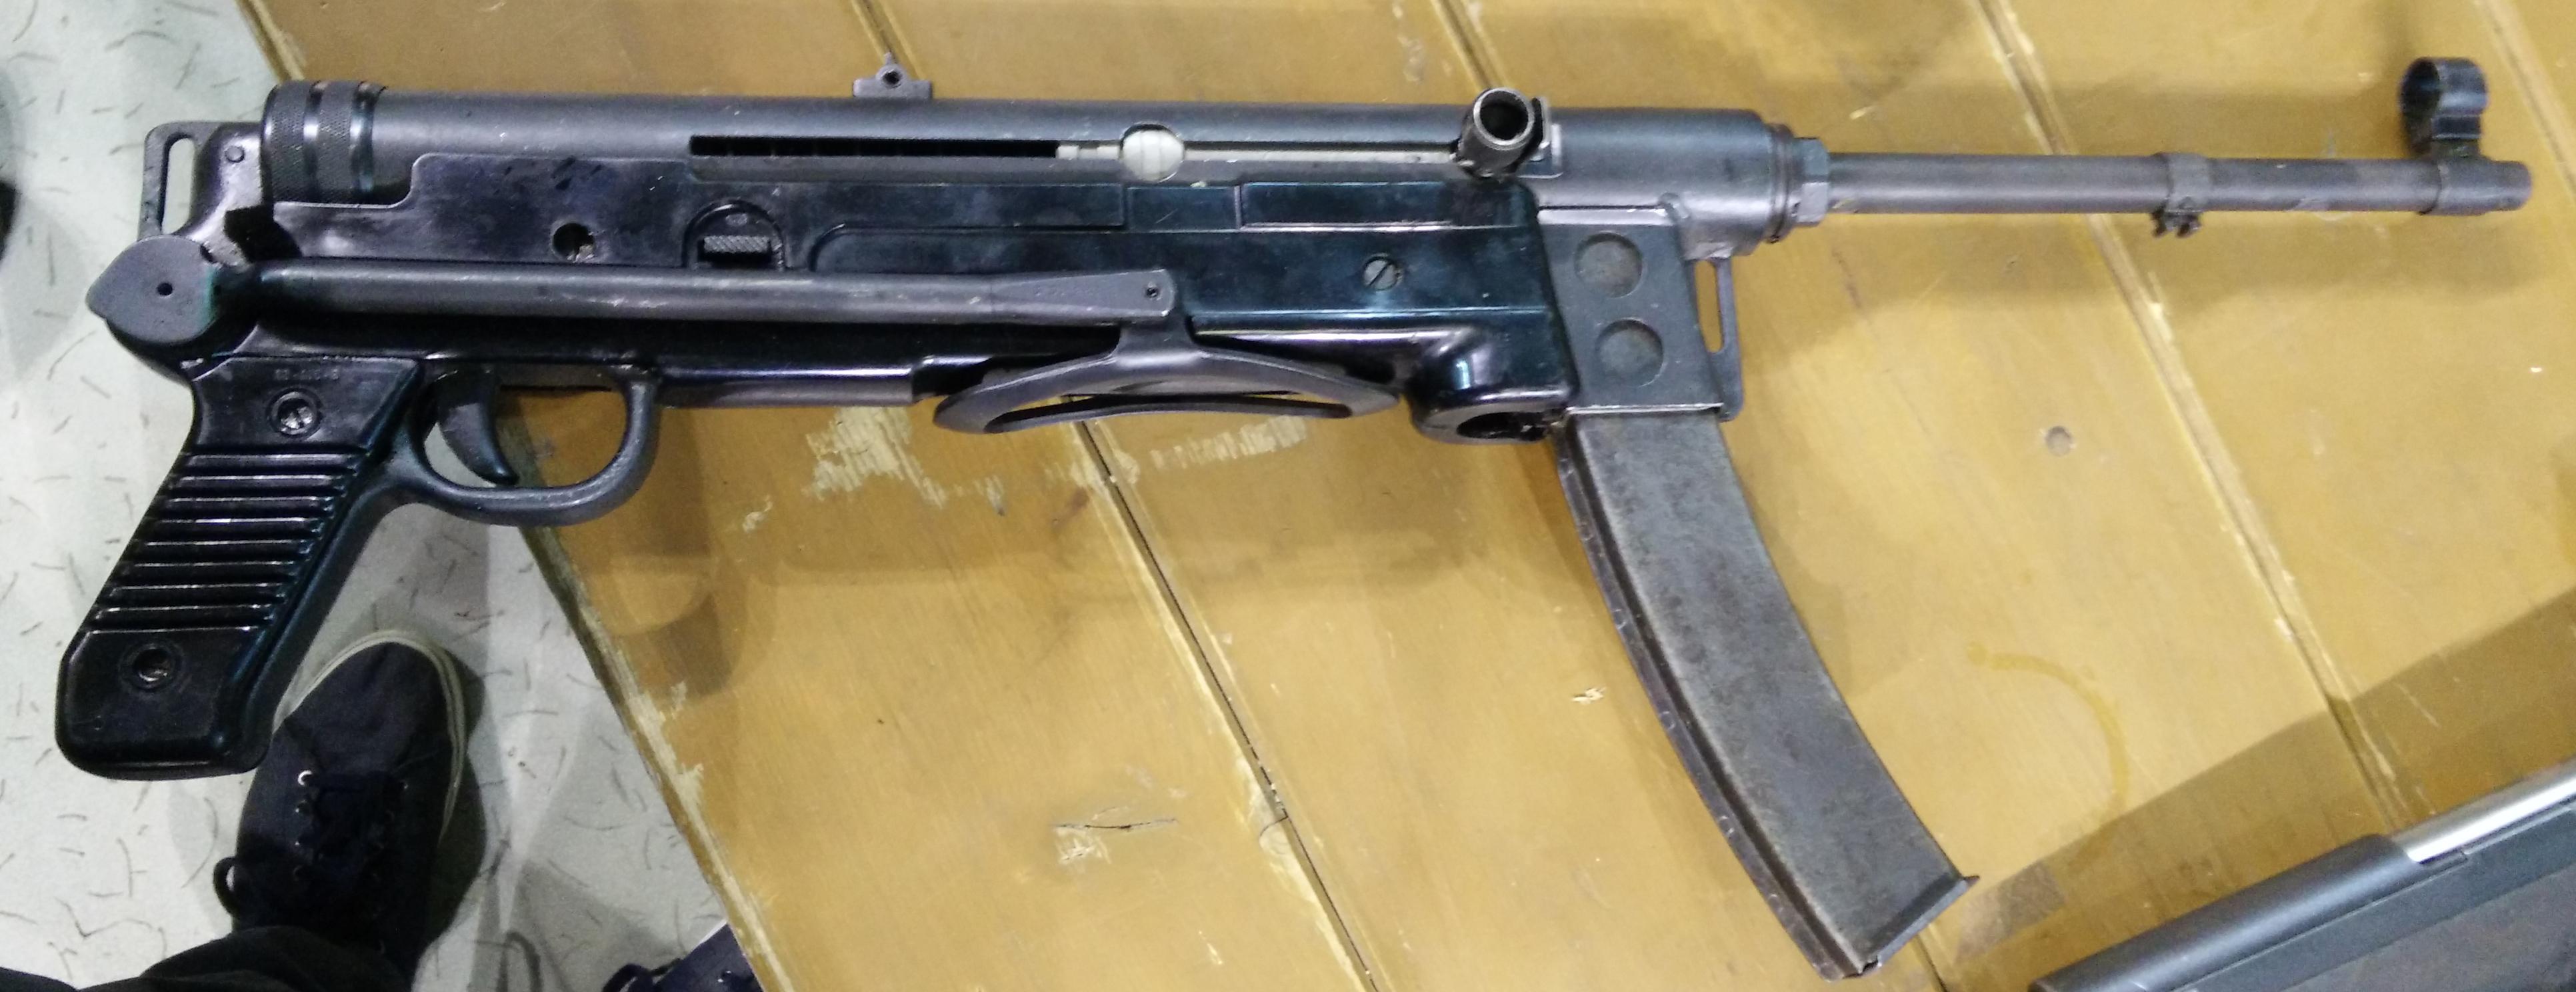 M56 submachine gun - Wikipedia